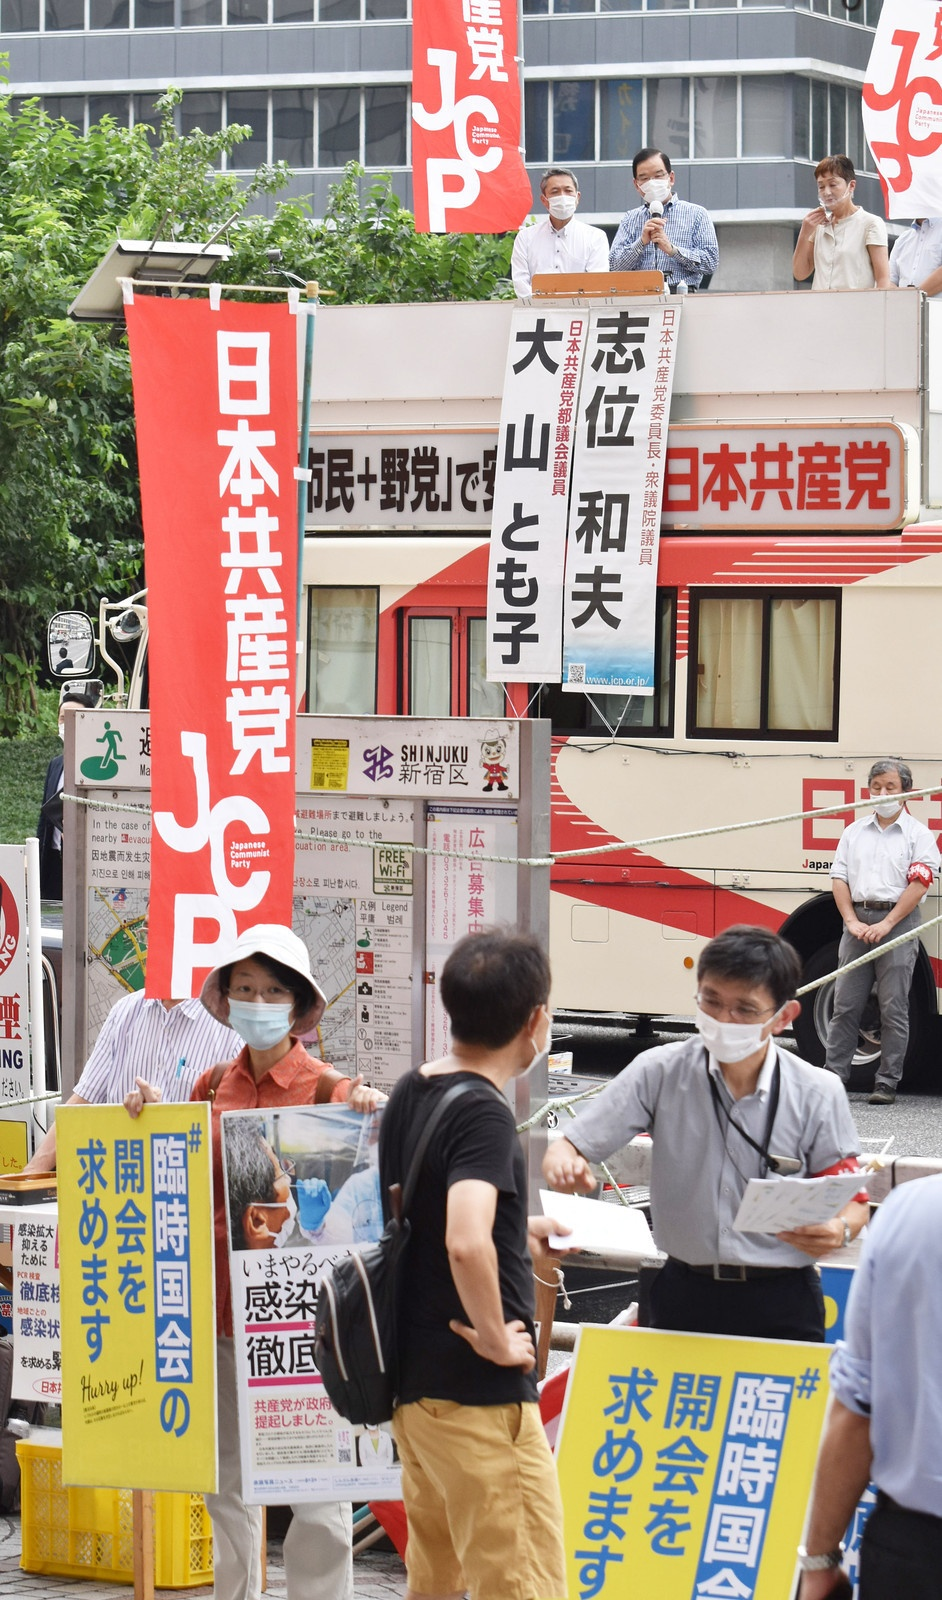 PCR検査の抜本的強化を求める緊急街頭演説。車上で訴える志位和夫委員長